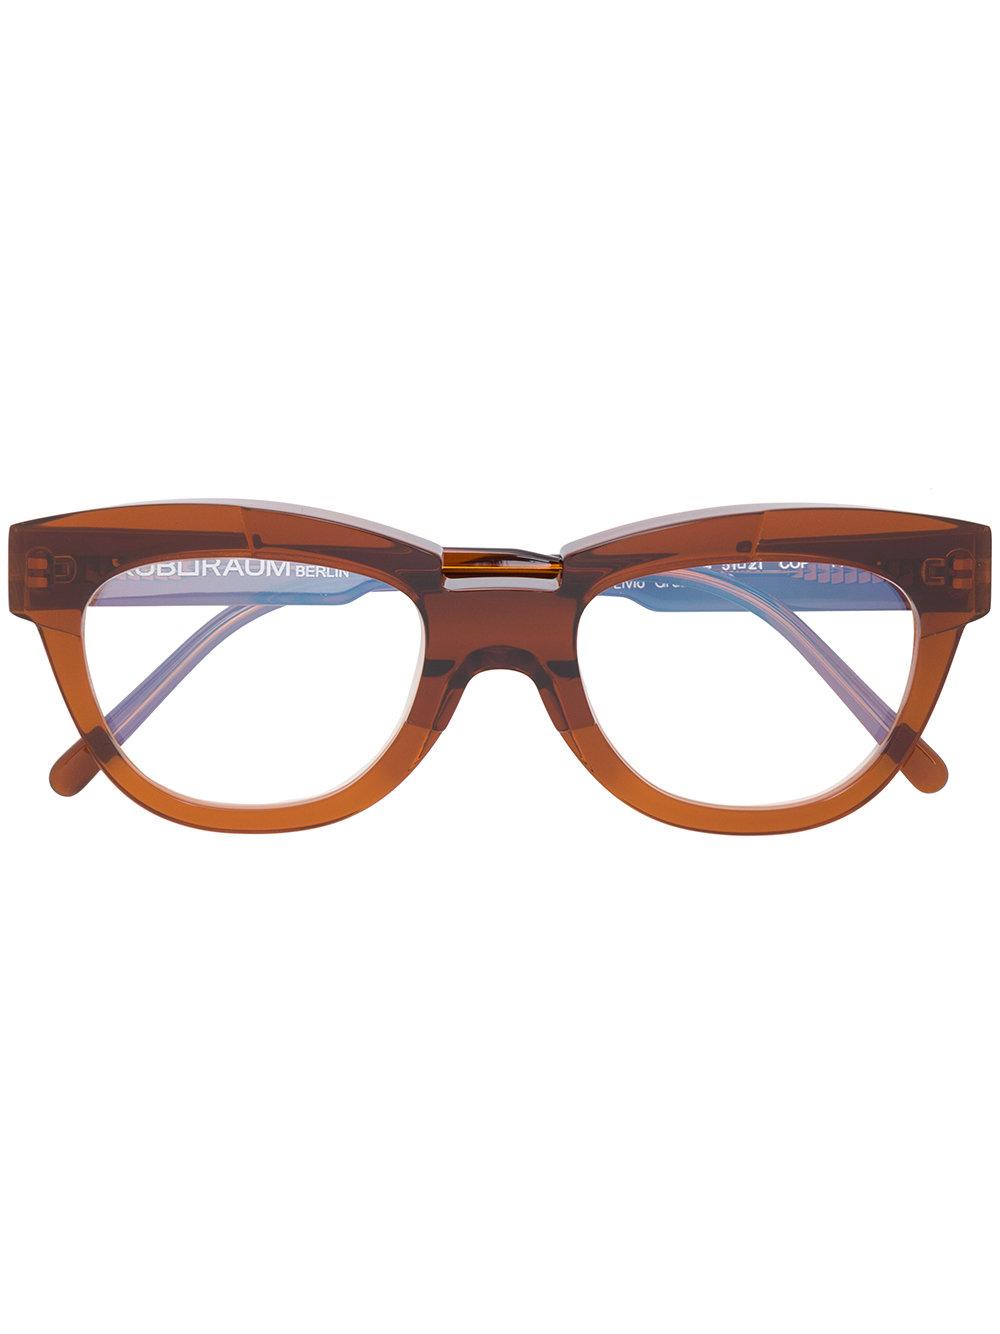 designer eyeglasses online eyeglasses brands list buy optical prescription frames 1 Jacques Marie Mage kuboraum